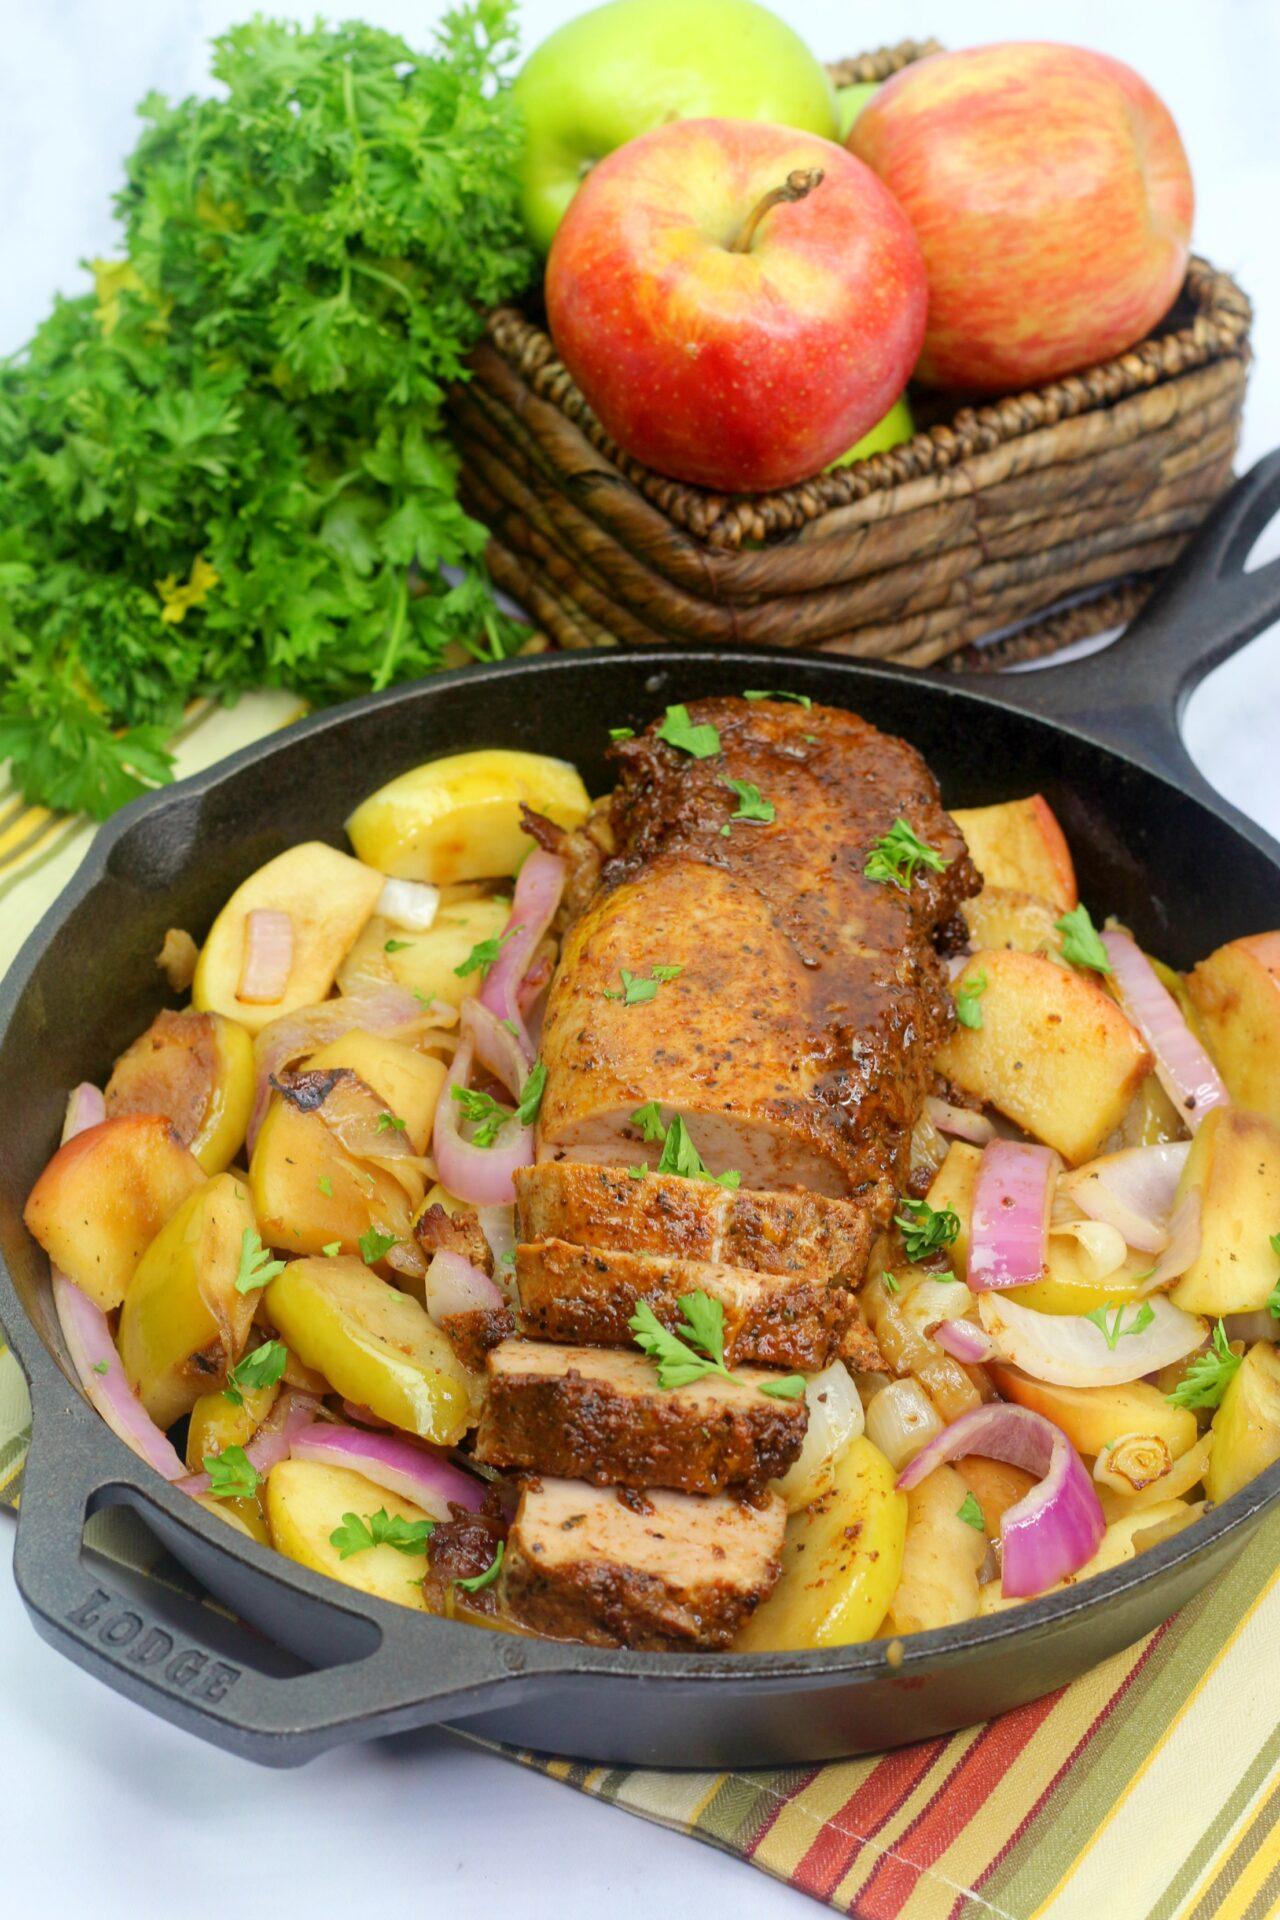 pork and apple bake